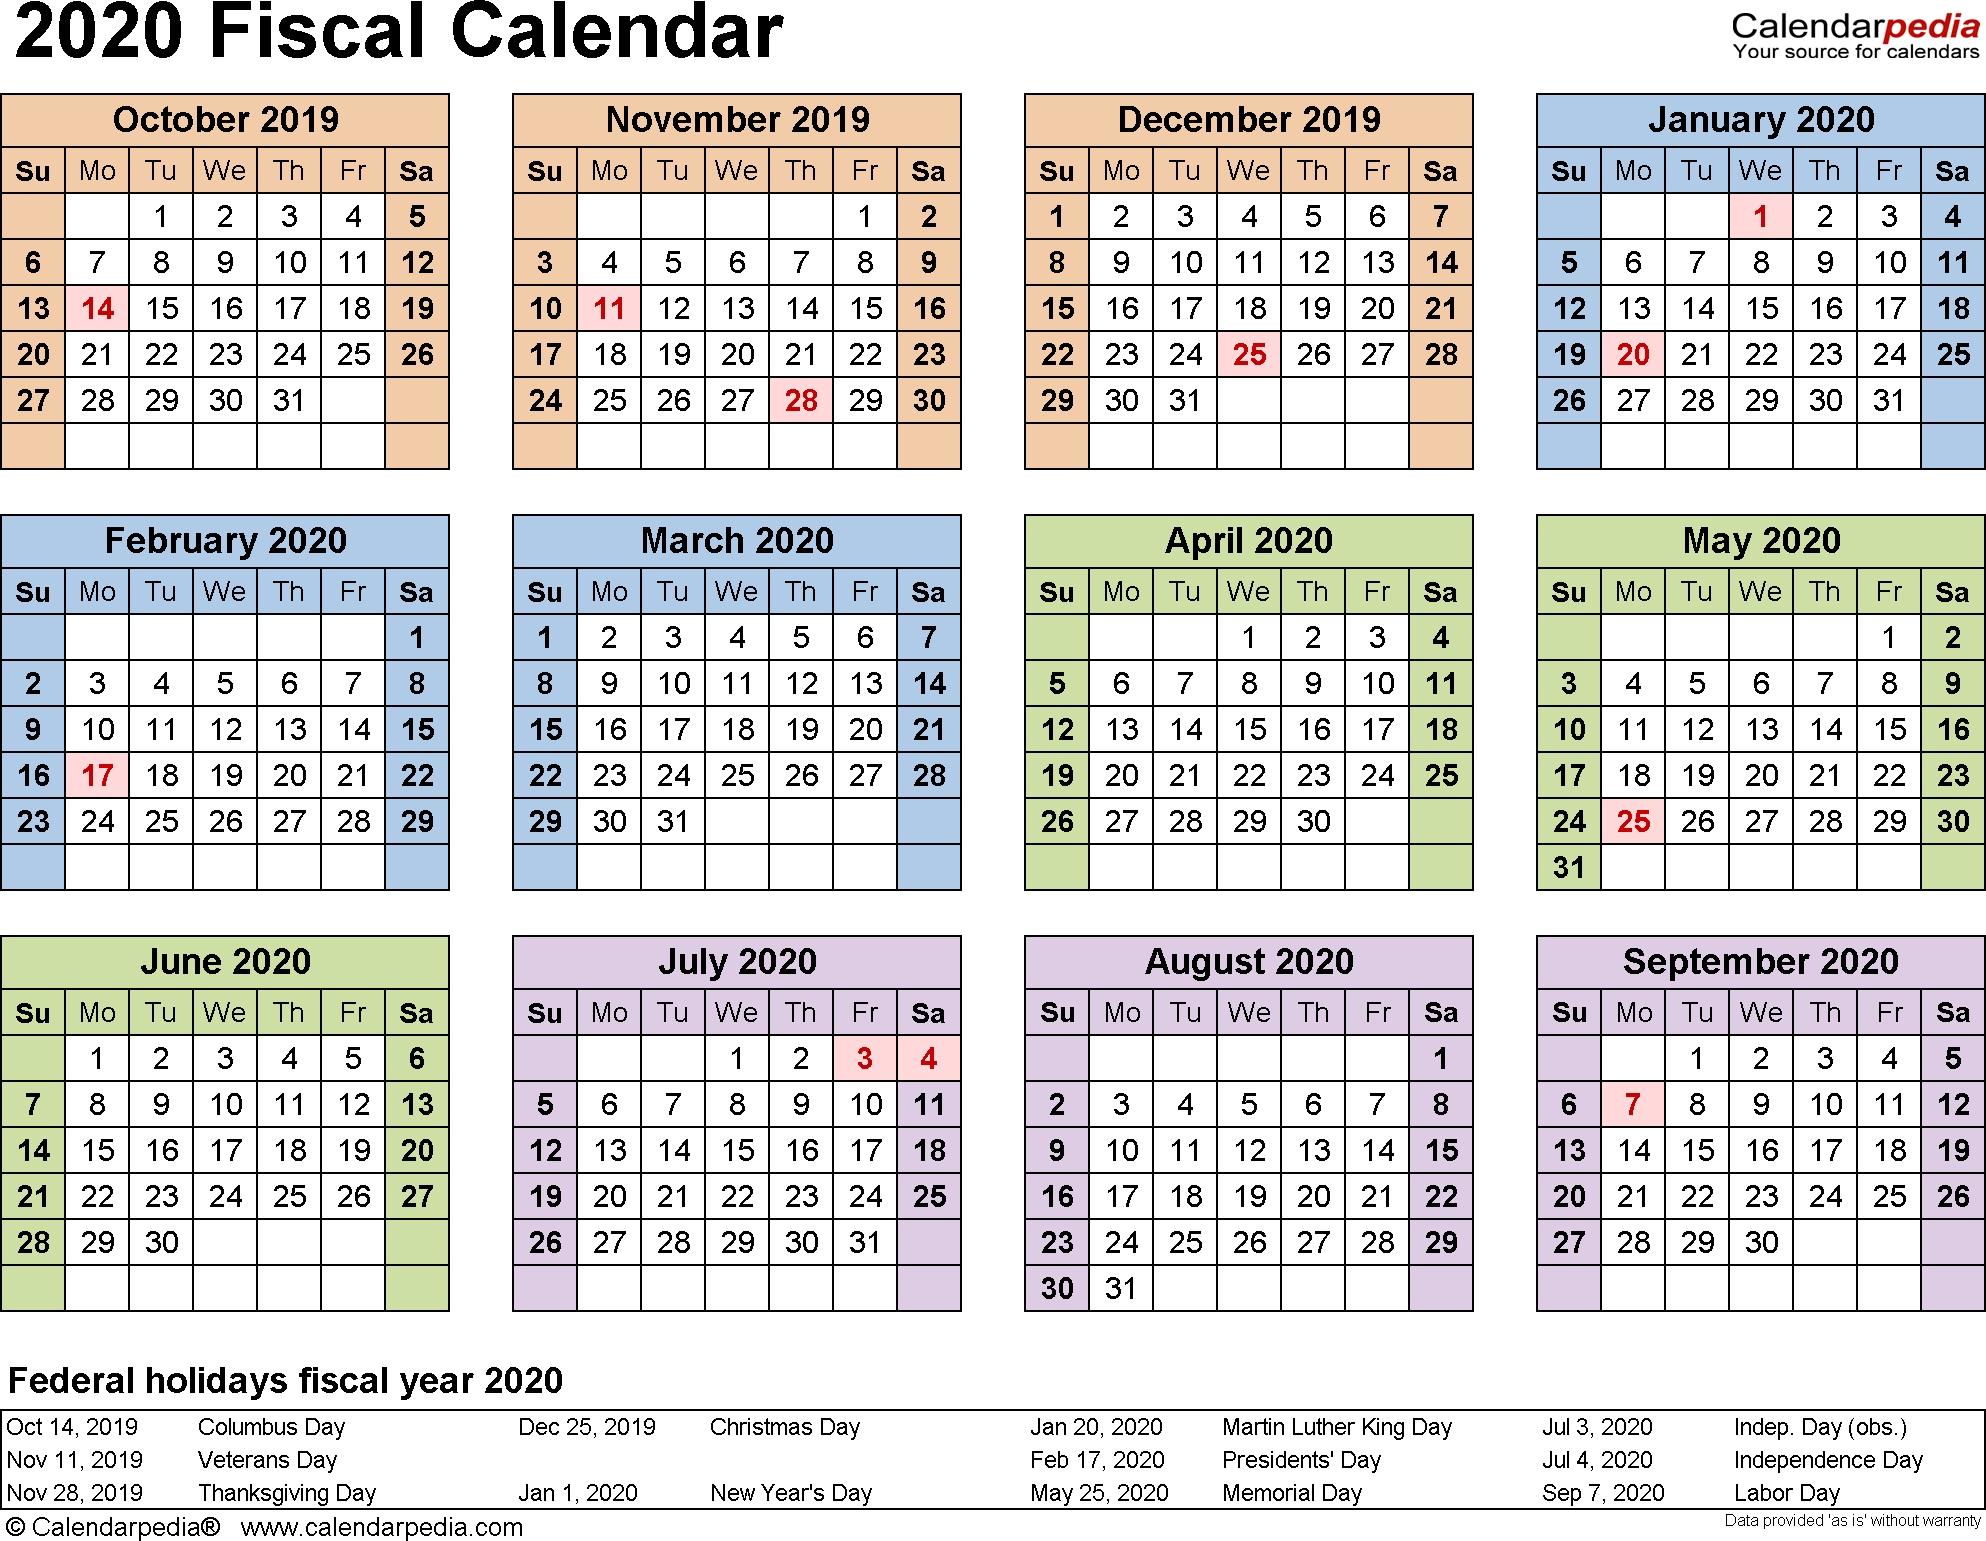 Fiscal Calendars 2020 As Free Printable Pdf Templates  2020 To 2020 Financial Year Calendar